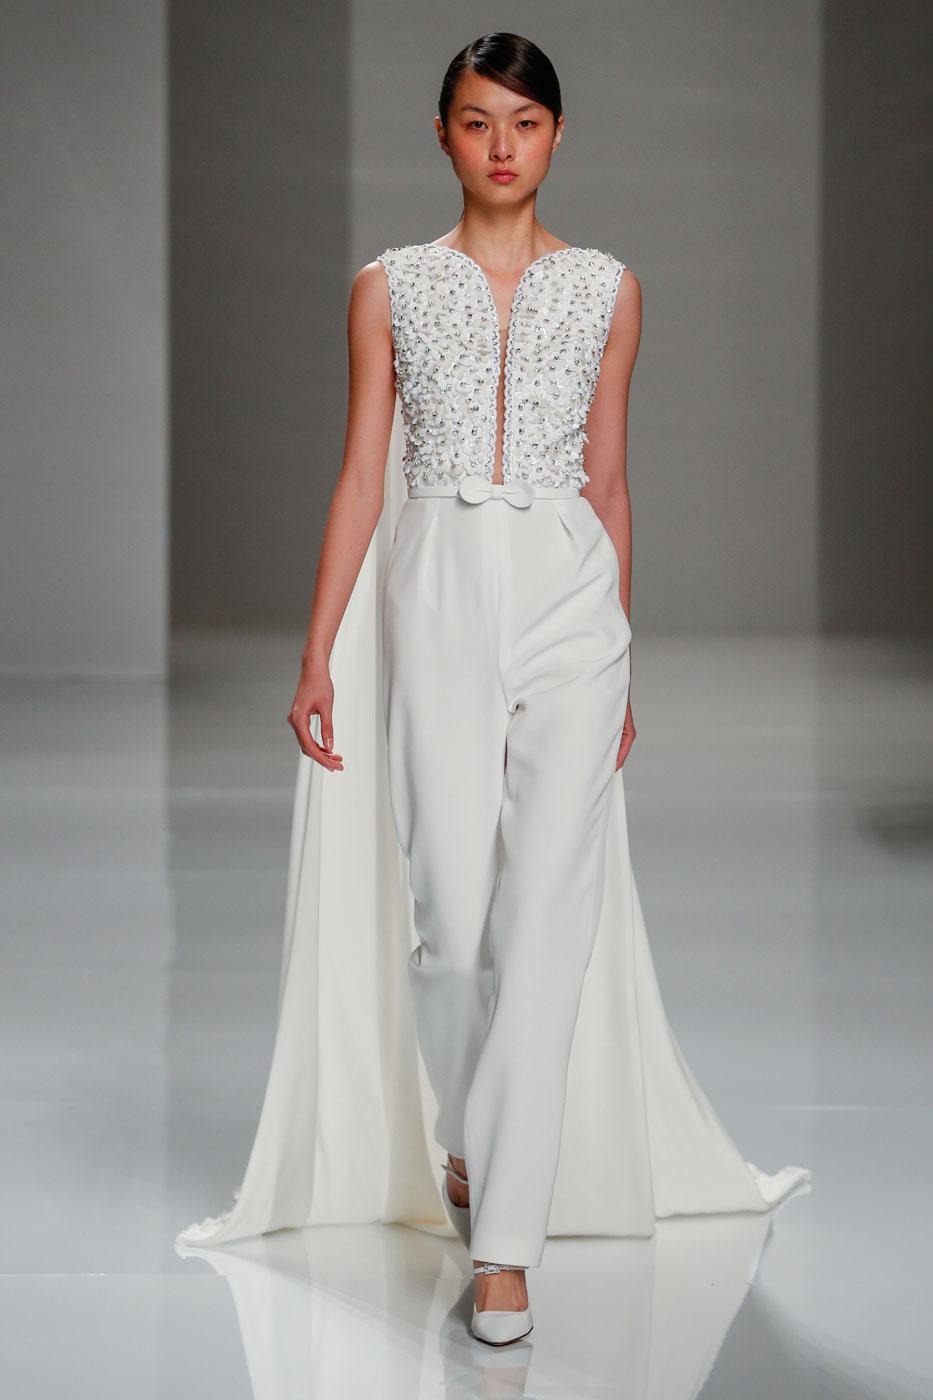 Georges-Hobeika-fashion-runway-show-haute-couture-paris-spring-2015-the-impression-31